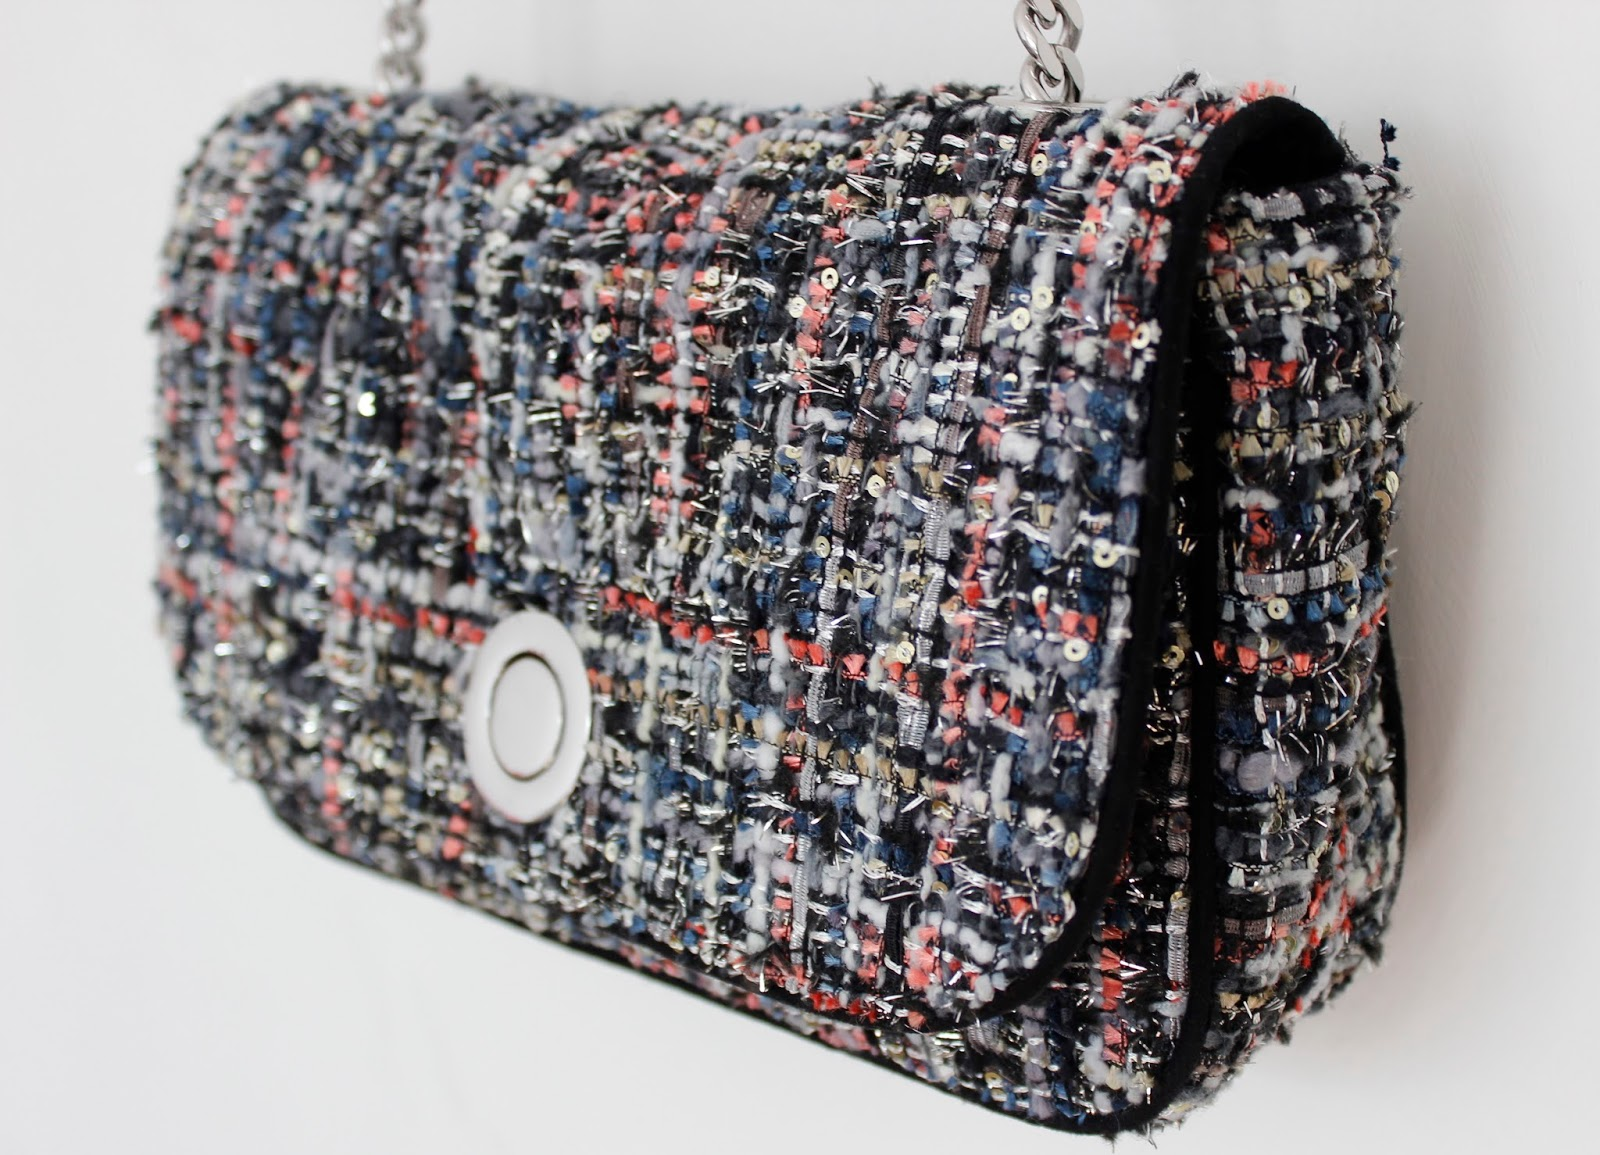 ZARA Tweed Messenger Bag £39.99